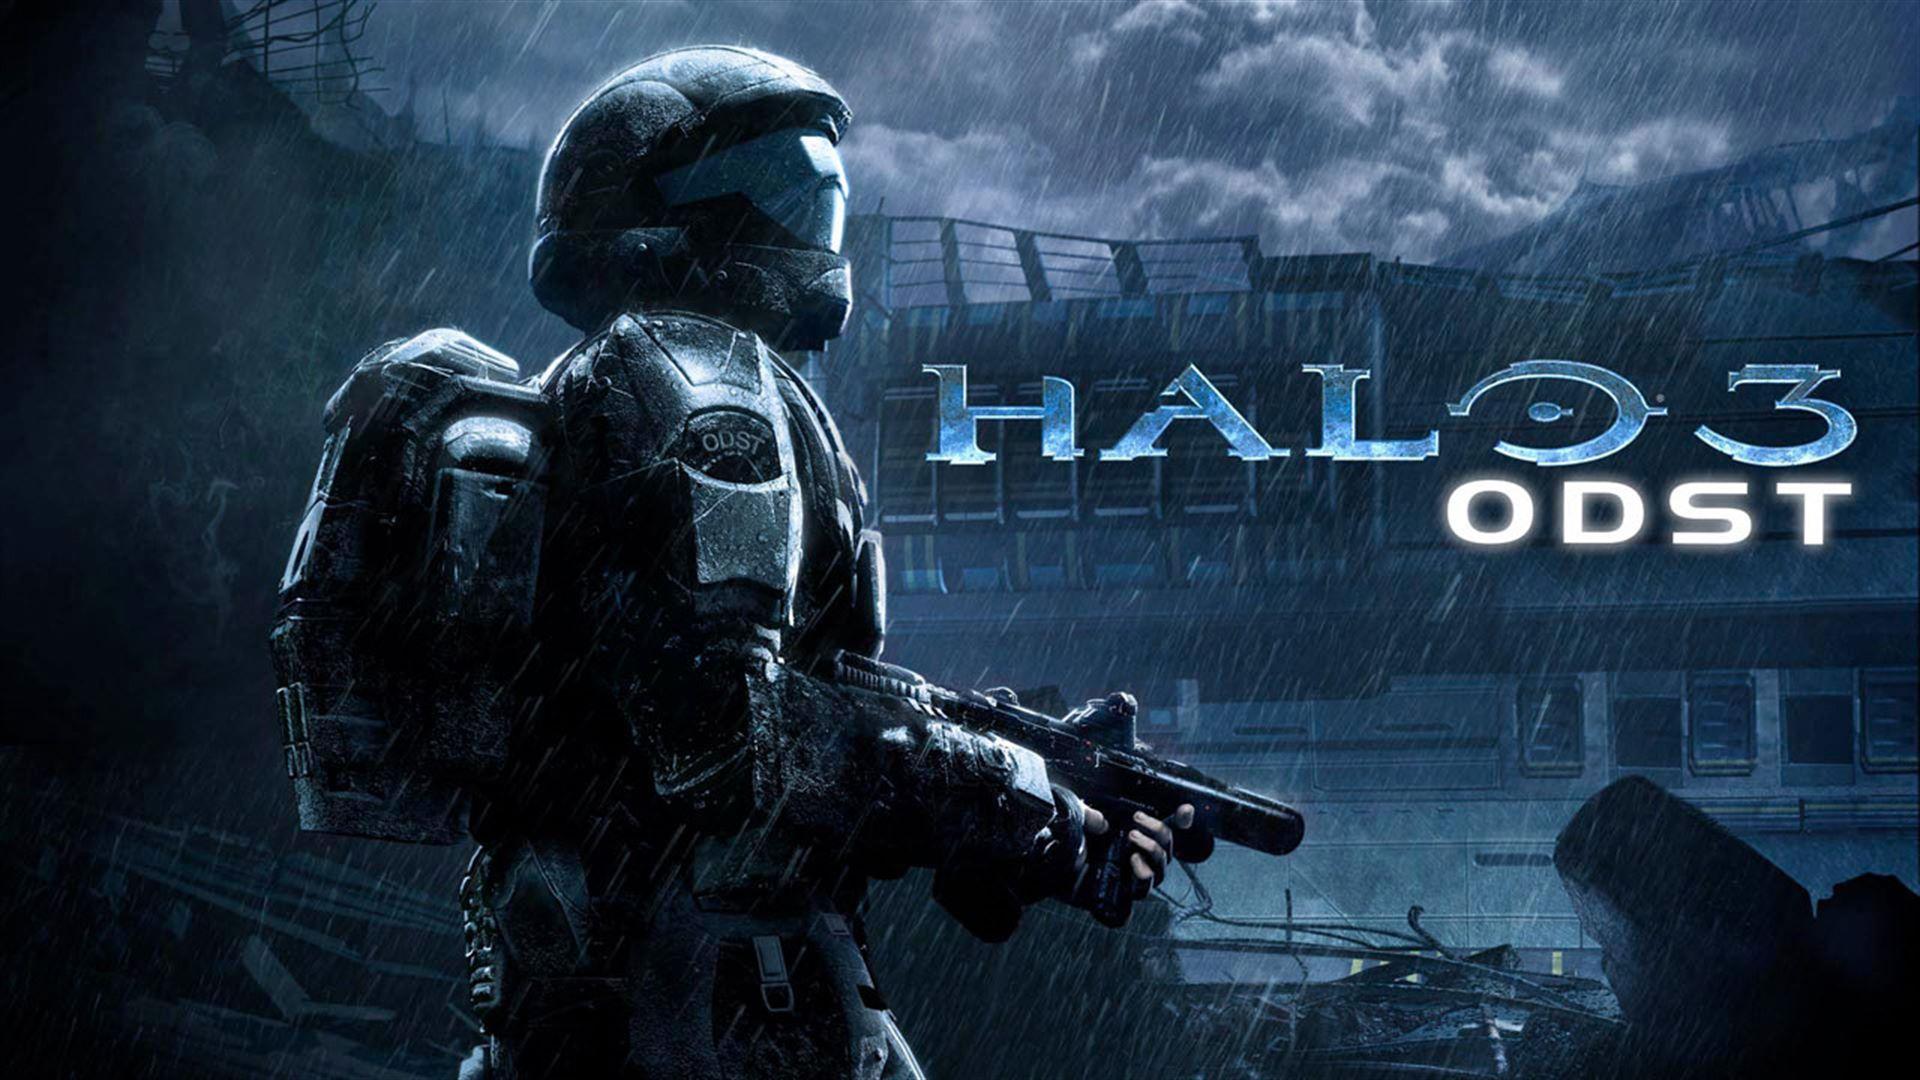 Buy halo 3 odst campaign edition microsoft store en au - Halo odst images ...